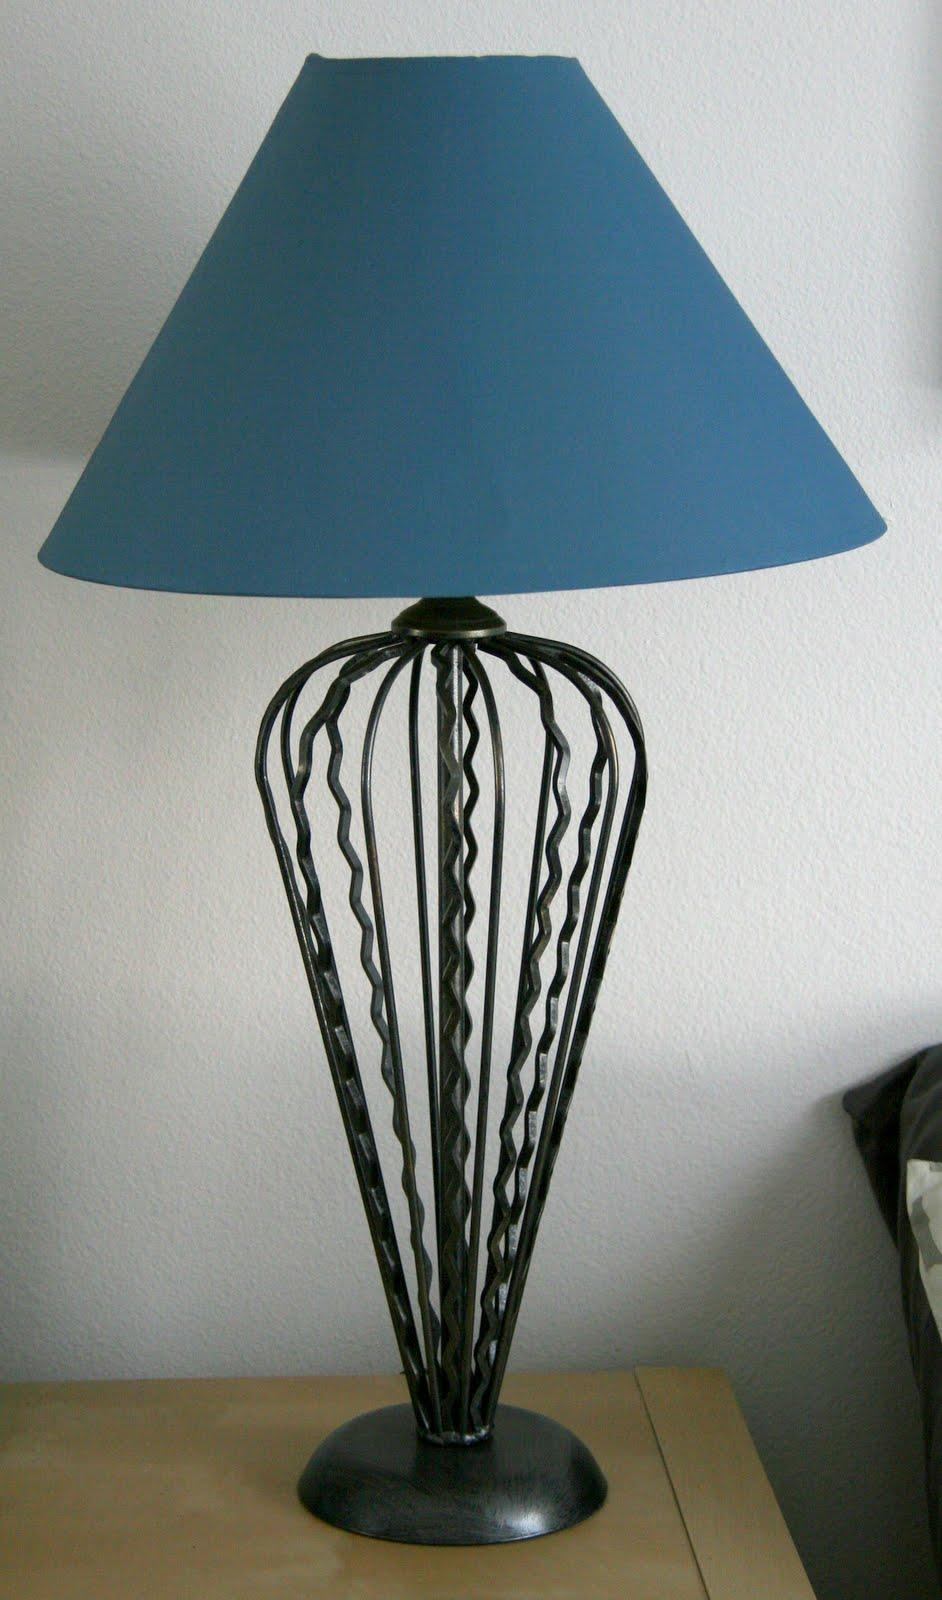 Swingncocoa felt lampshade diy aloadofball Image collections